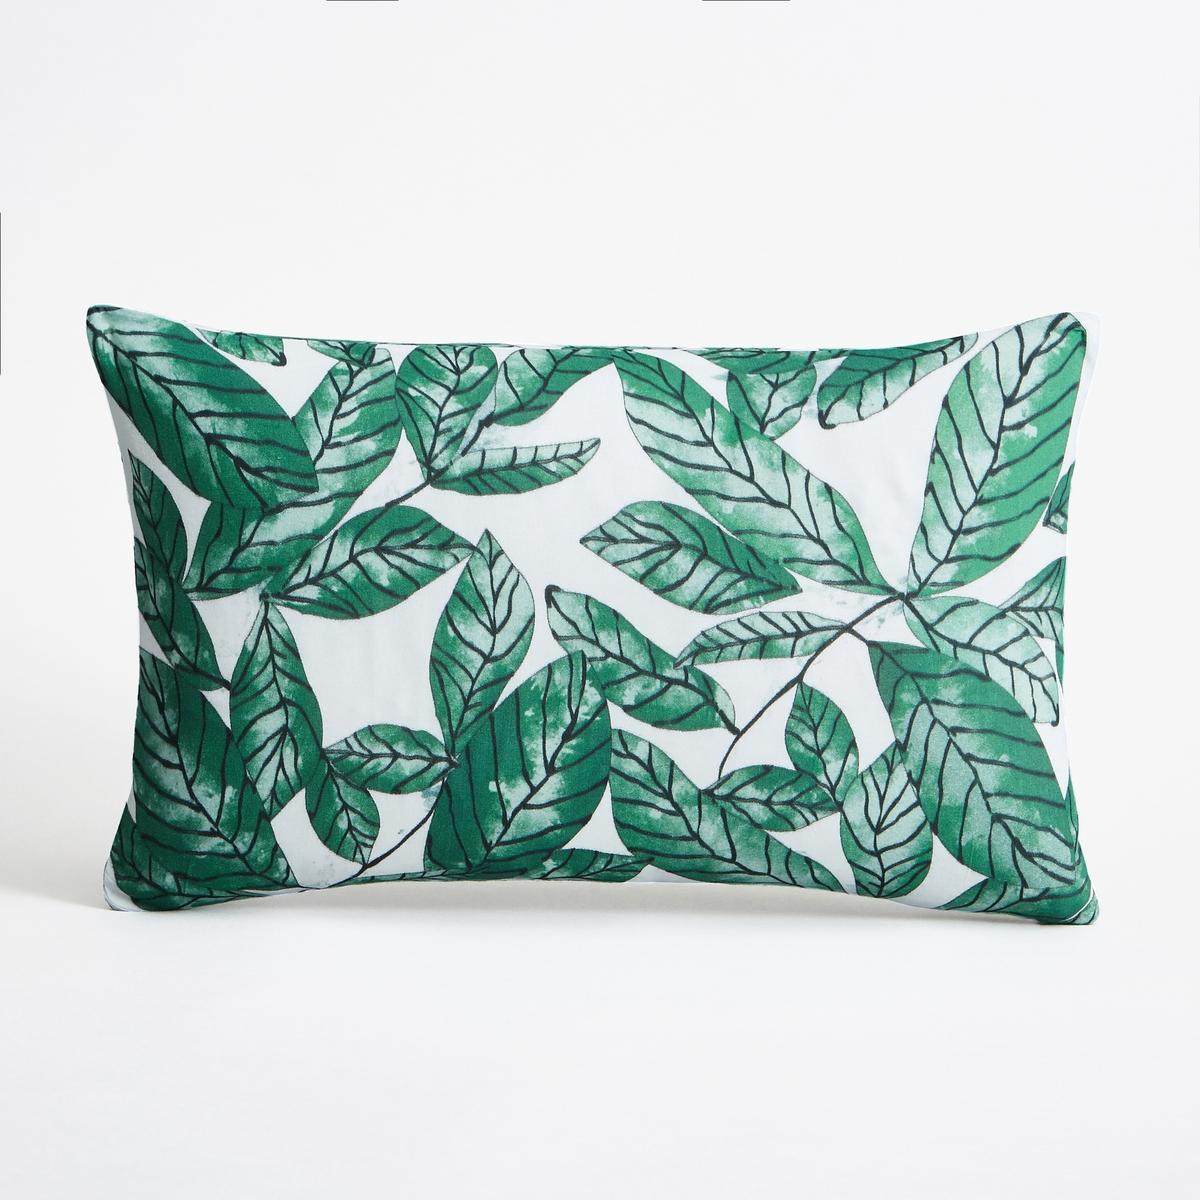 Наволочка на подушку-валик Malibas